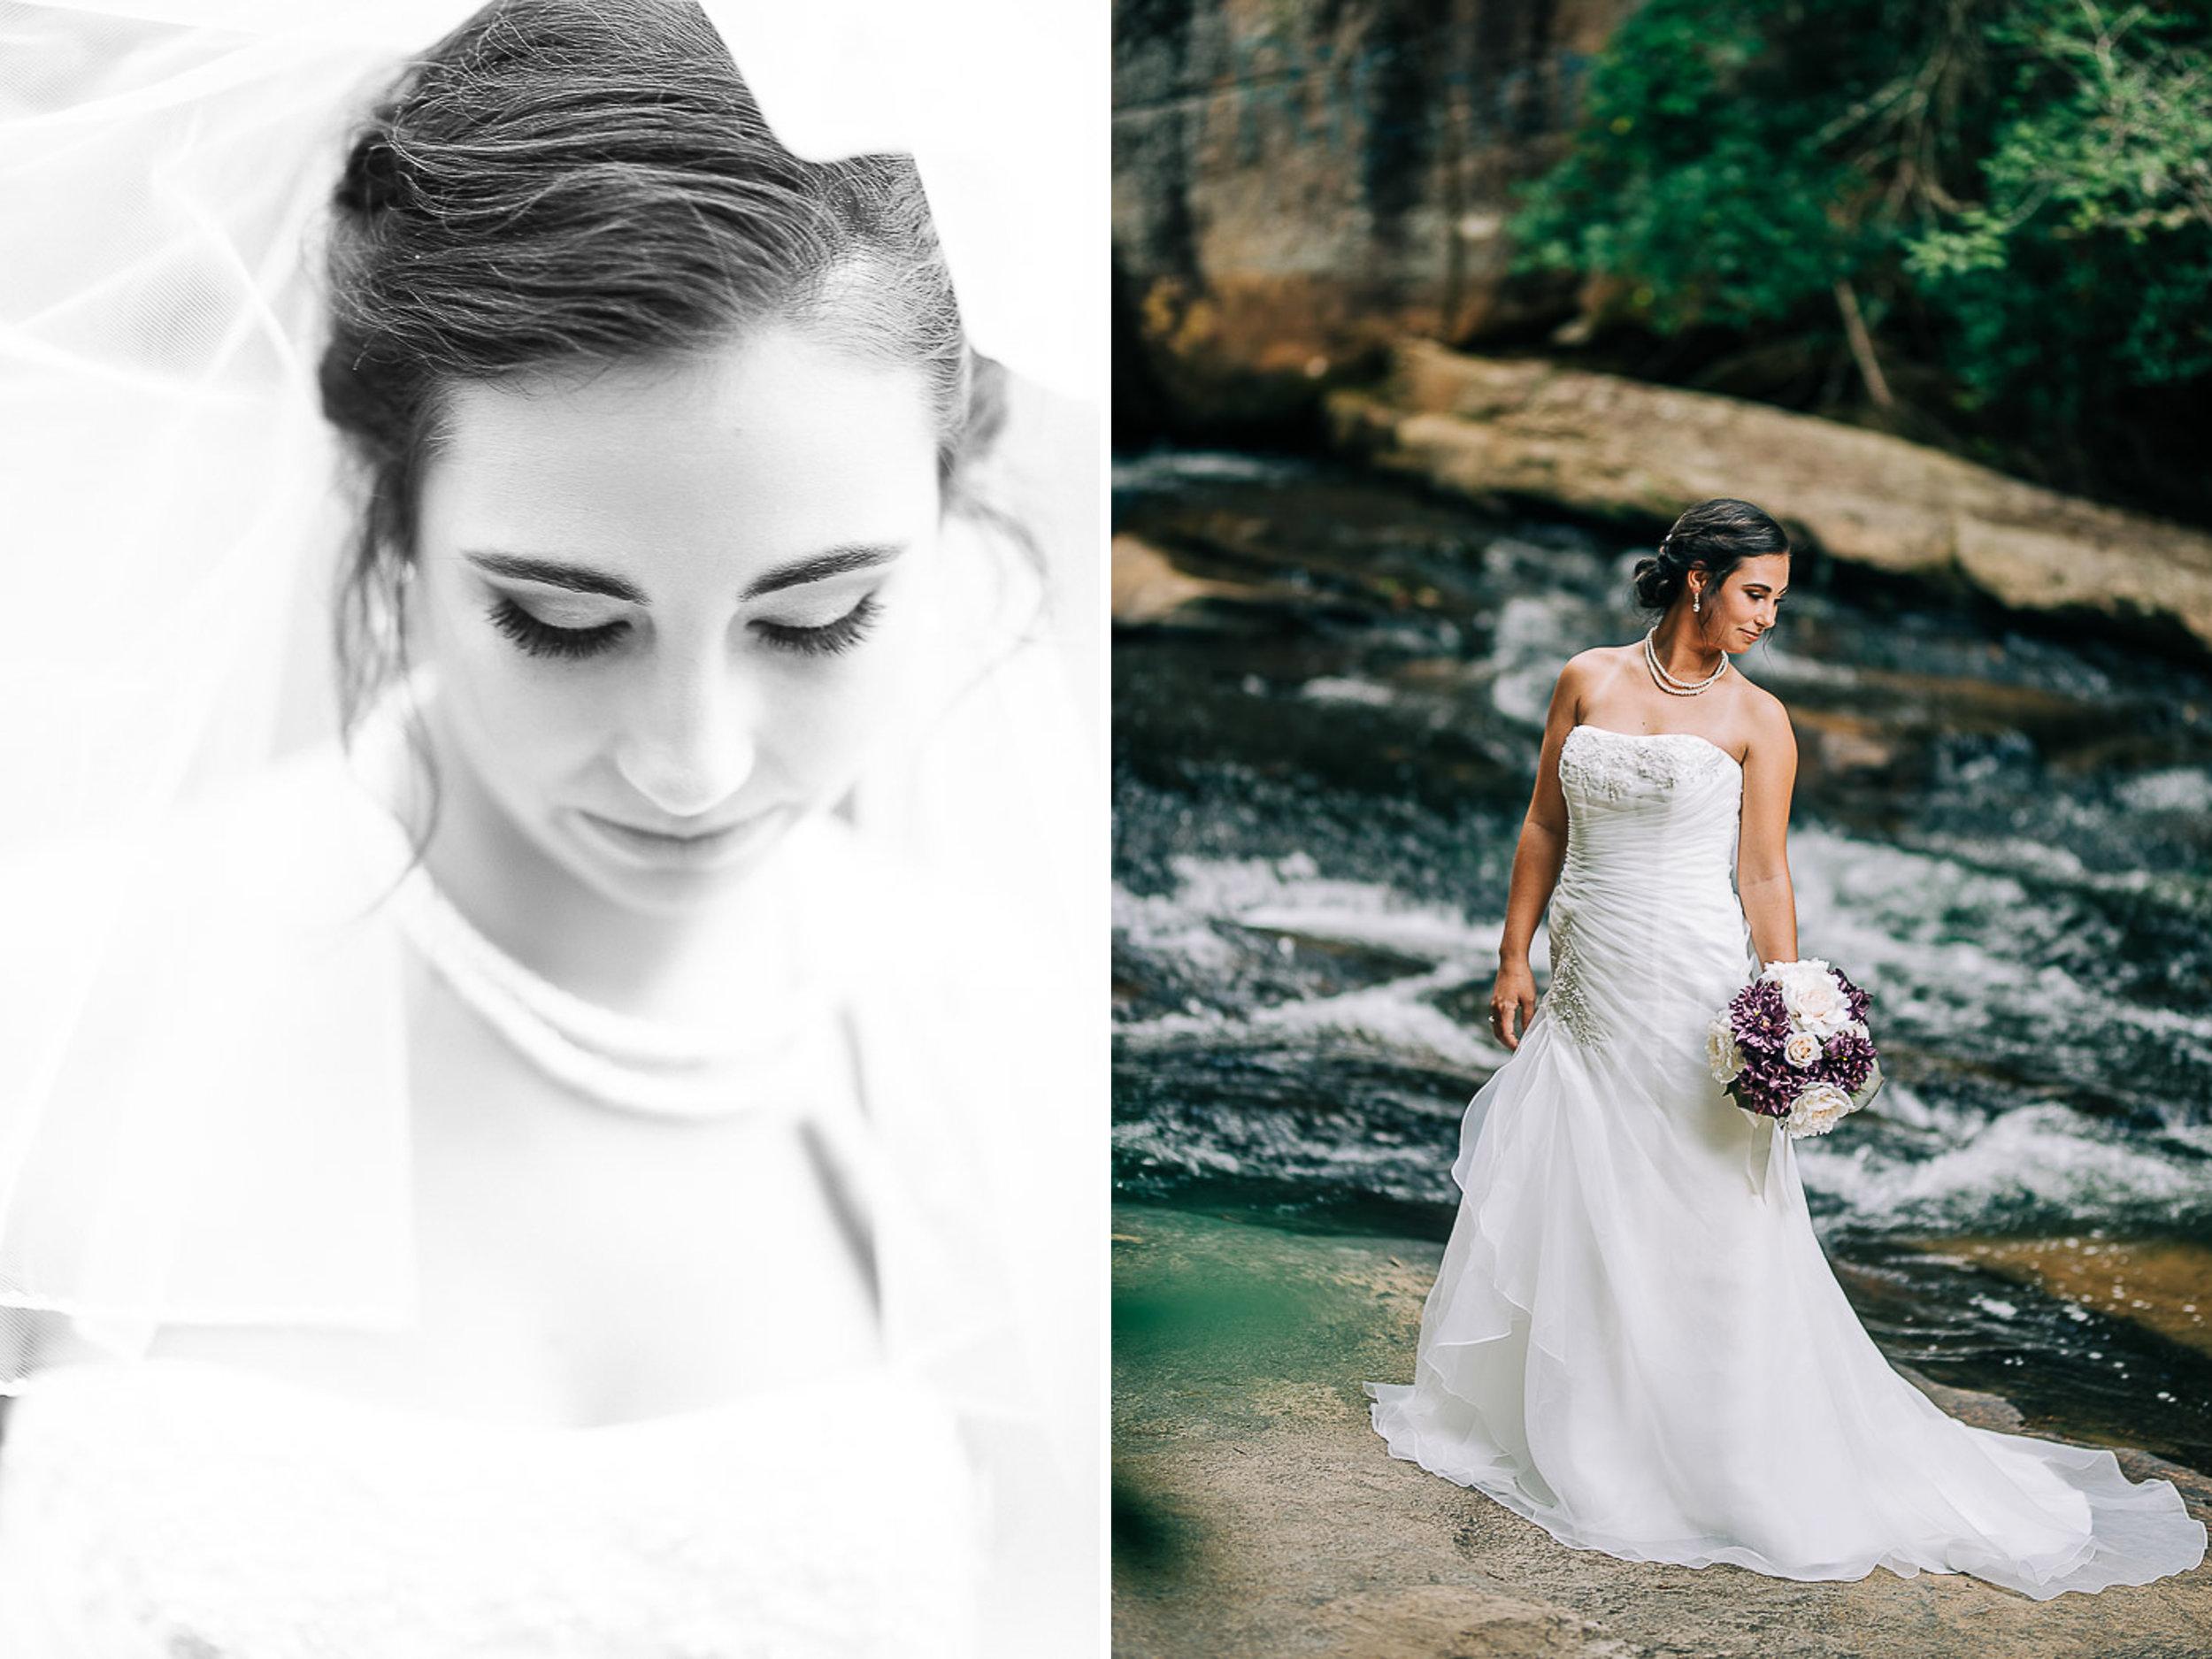 River Bridal Portraits, South Carolina Wedding Photographer, 09.jpg